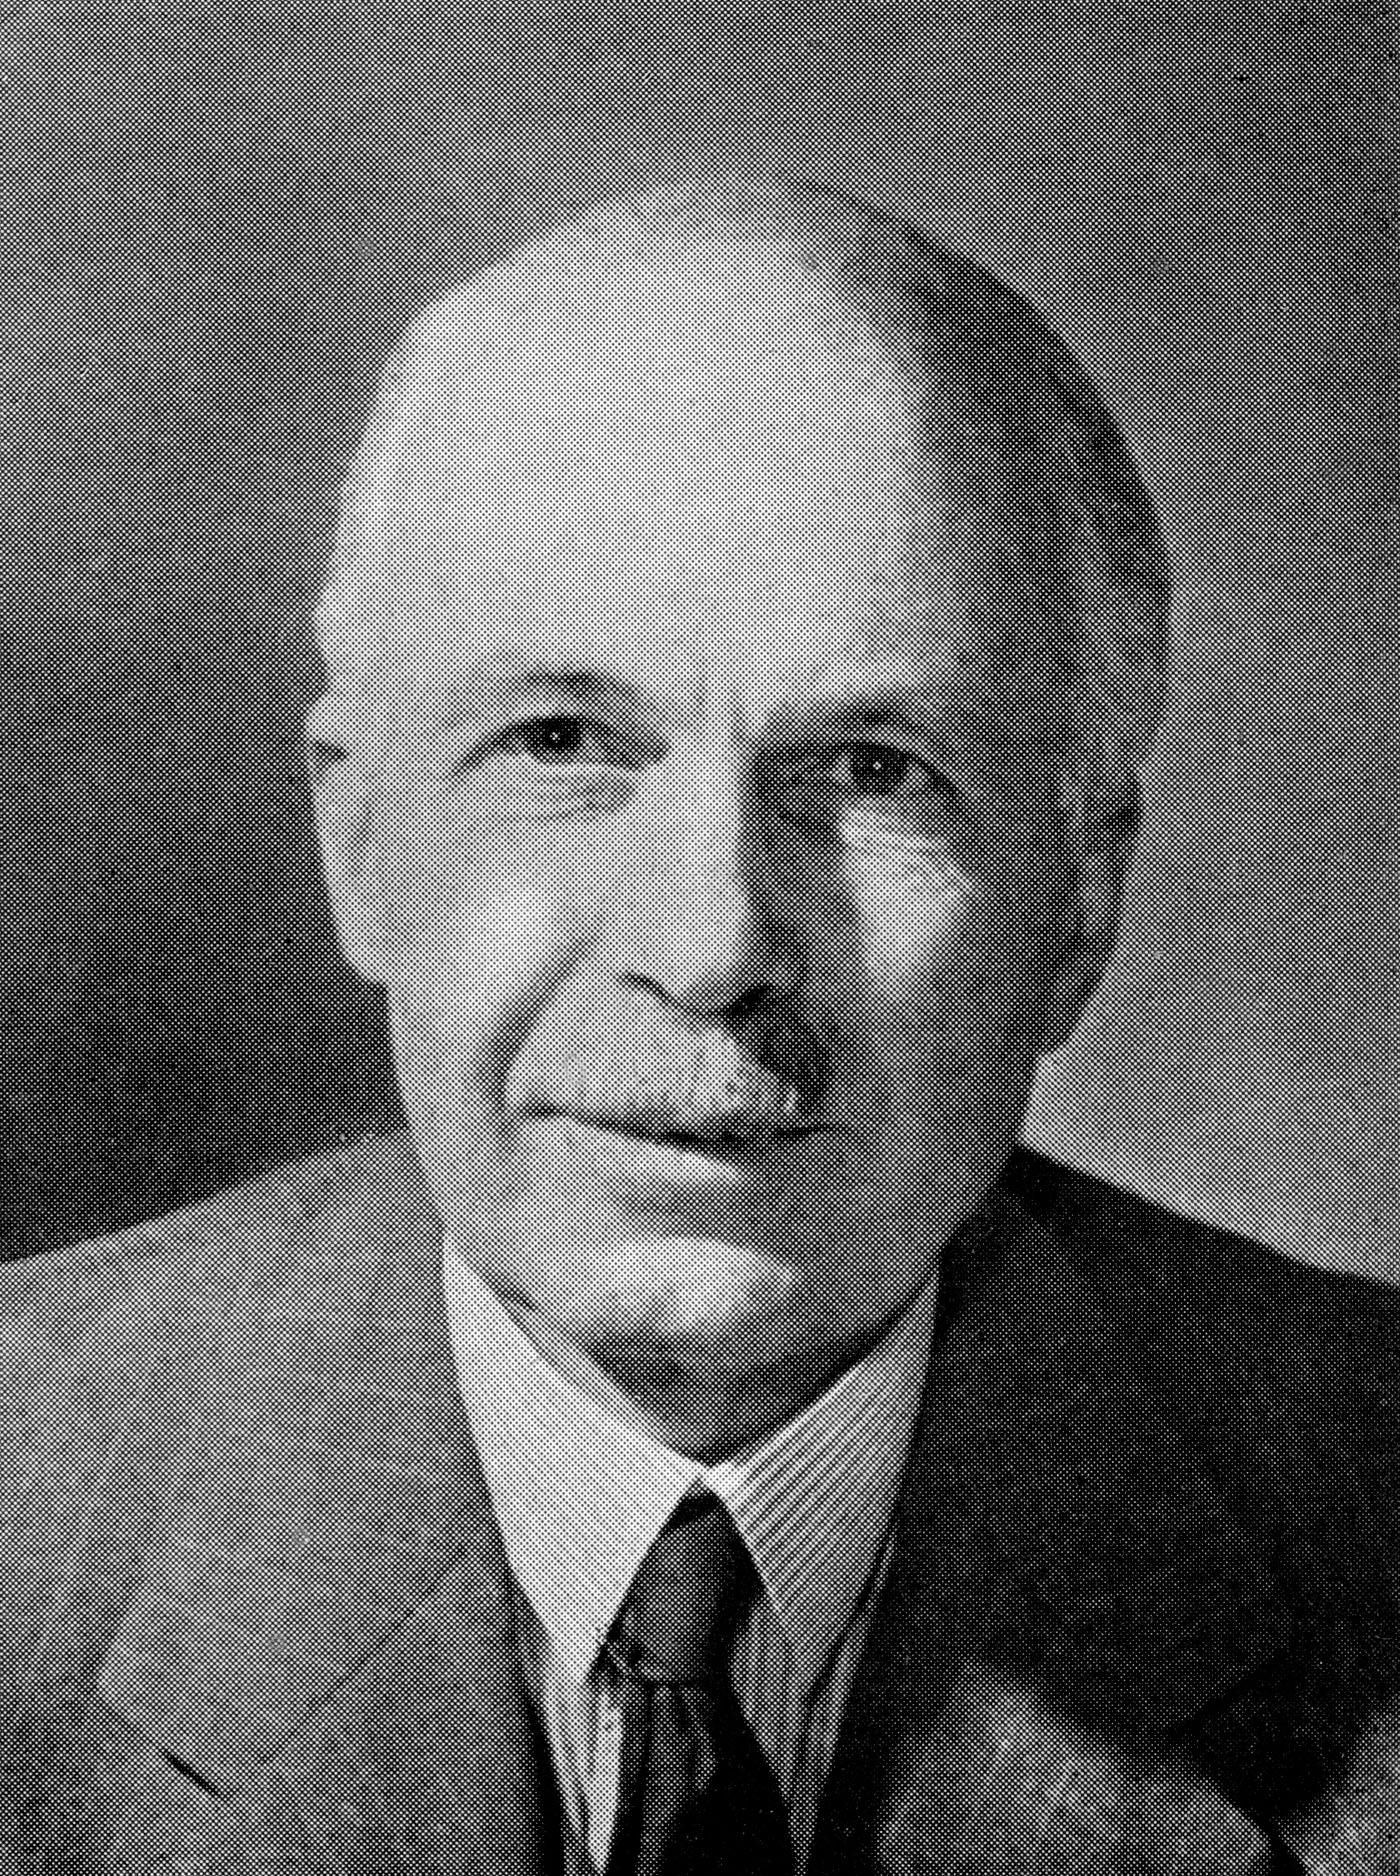 Sir Laurence Bragg